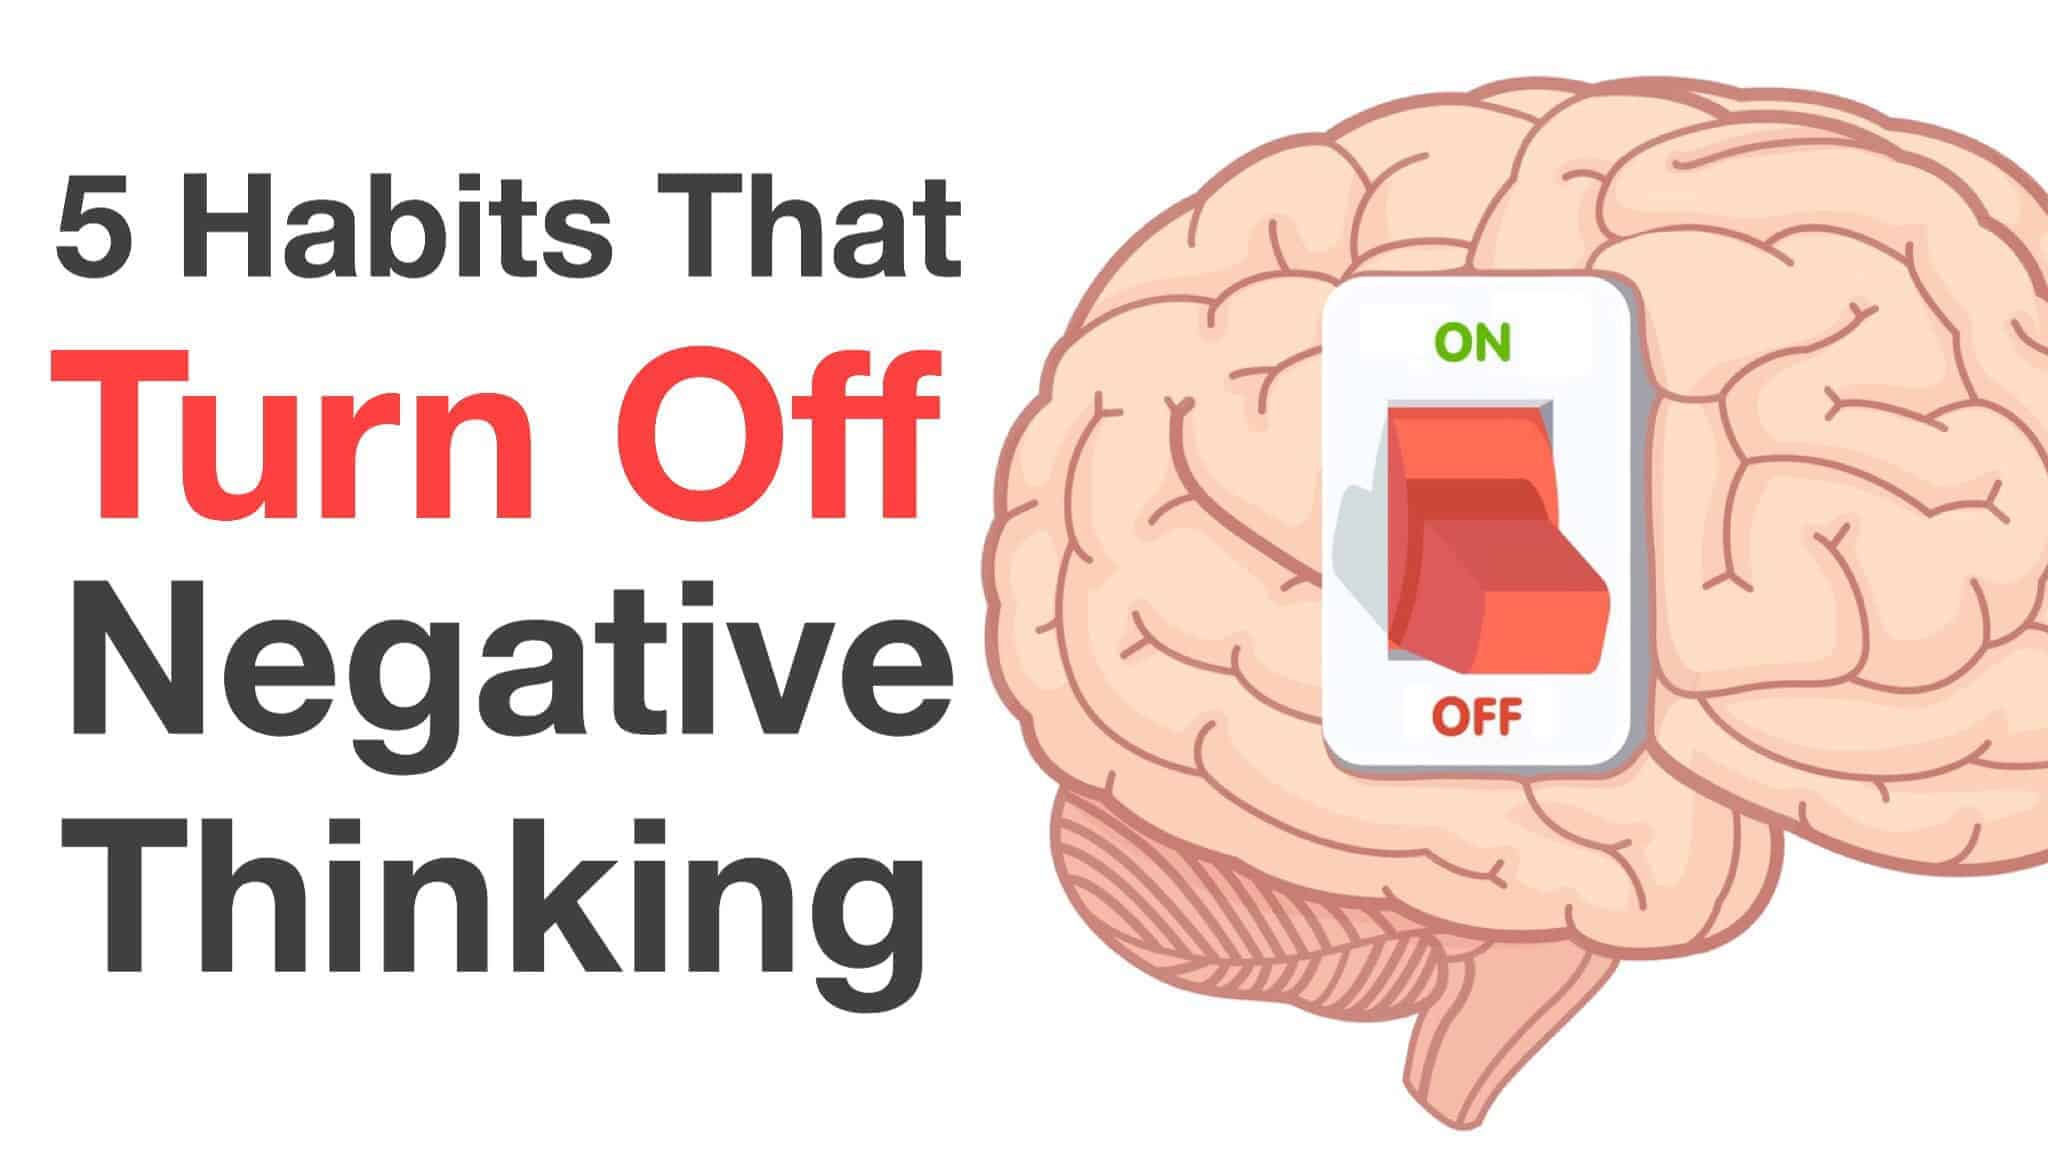 5 Habits That Turn Off Negative Thinking